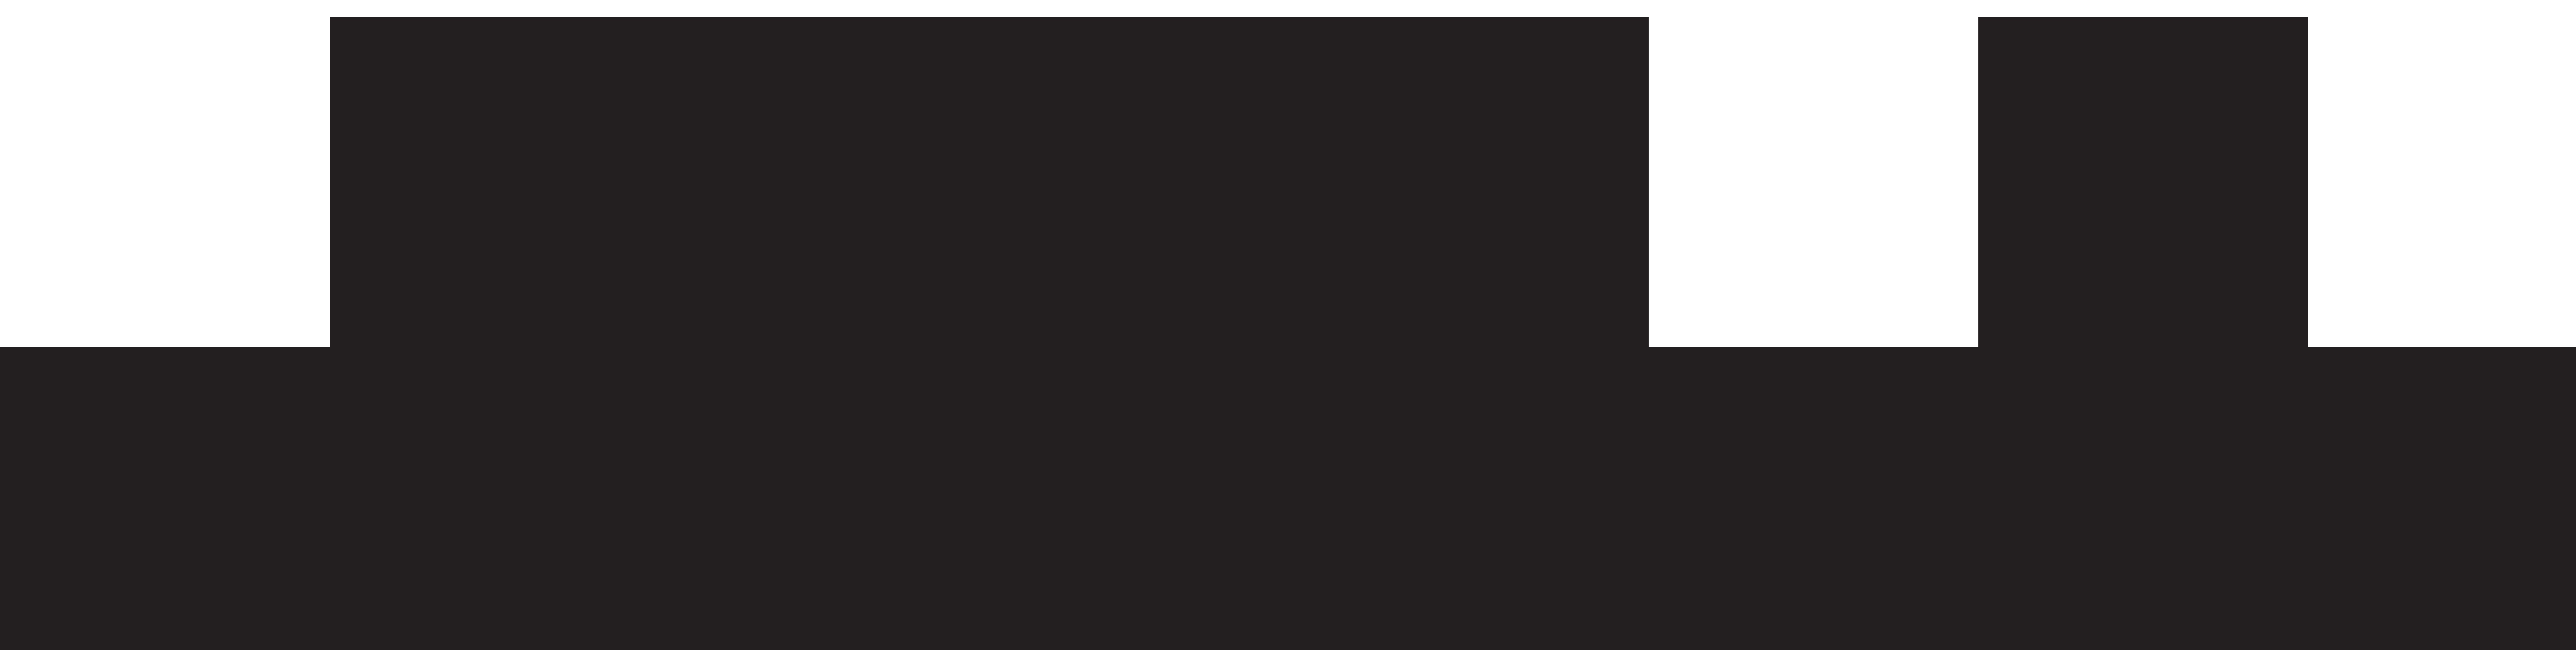 Egypt clipart skyline. New york silhouette free